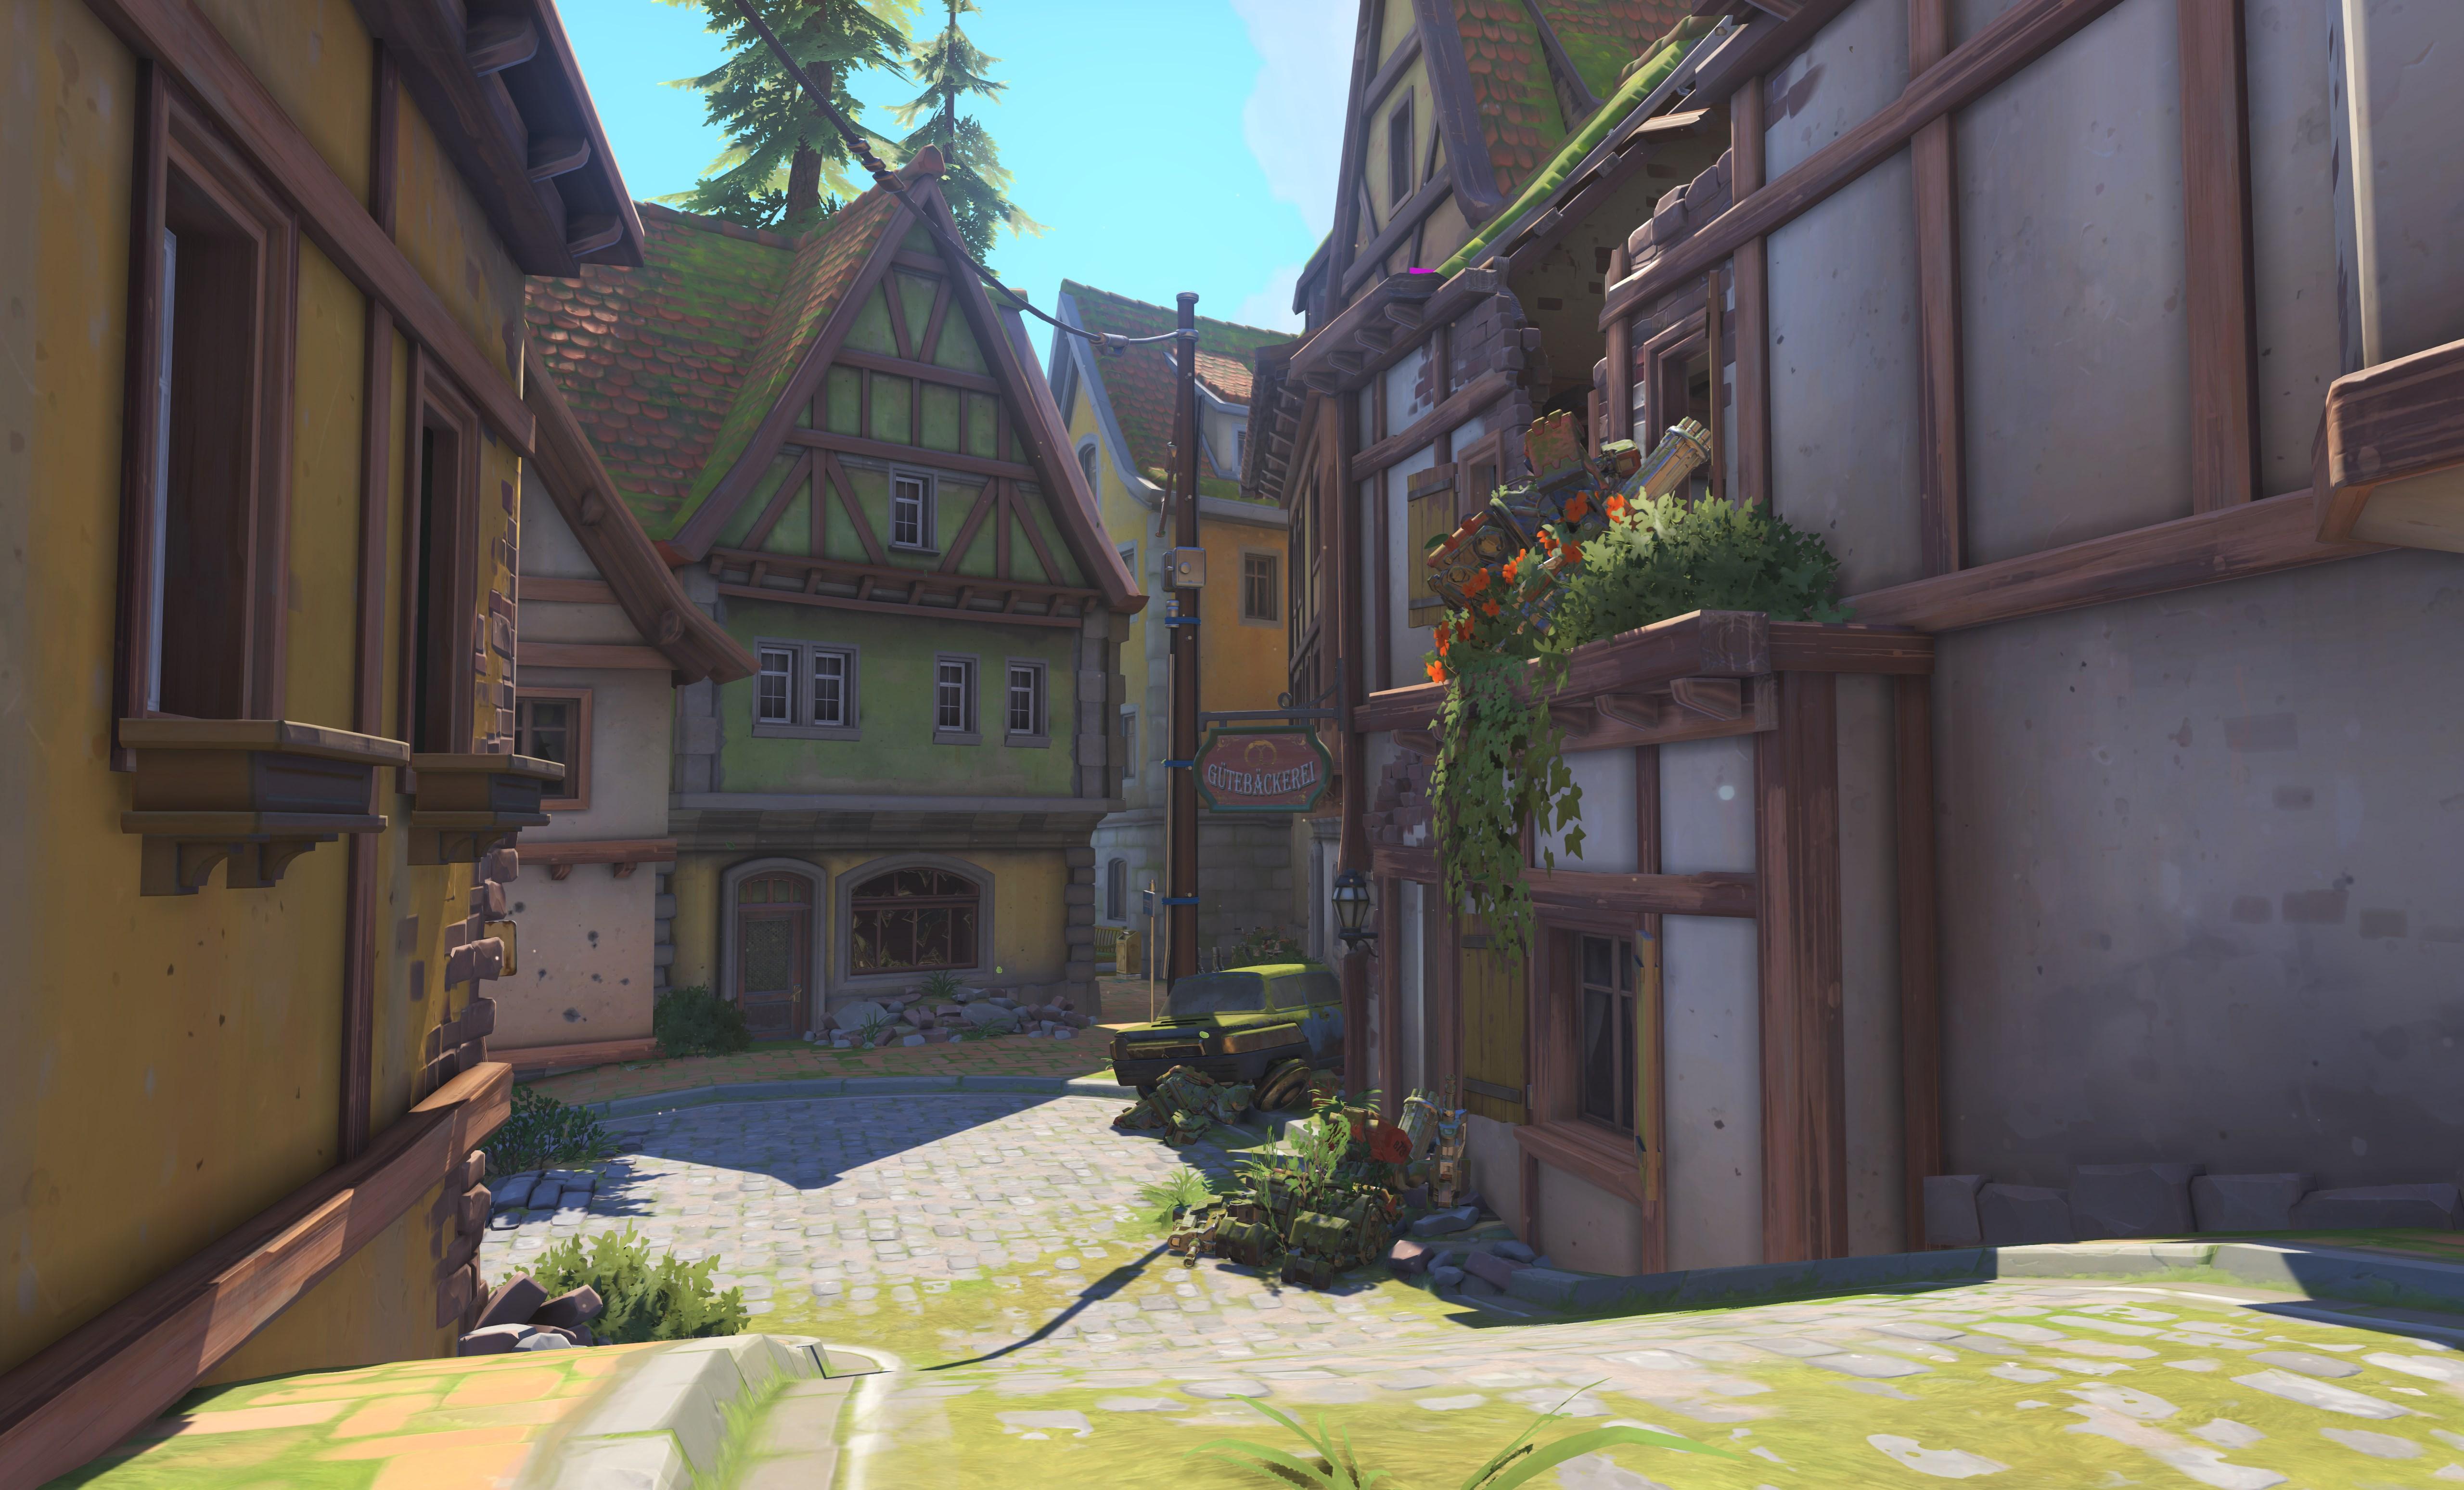 Eichenwalde là bản đồ thứ 13 của Overwatch - Ảnh 11